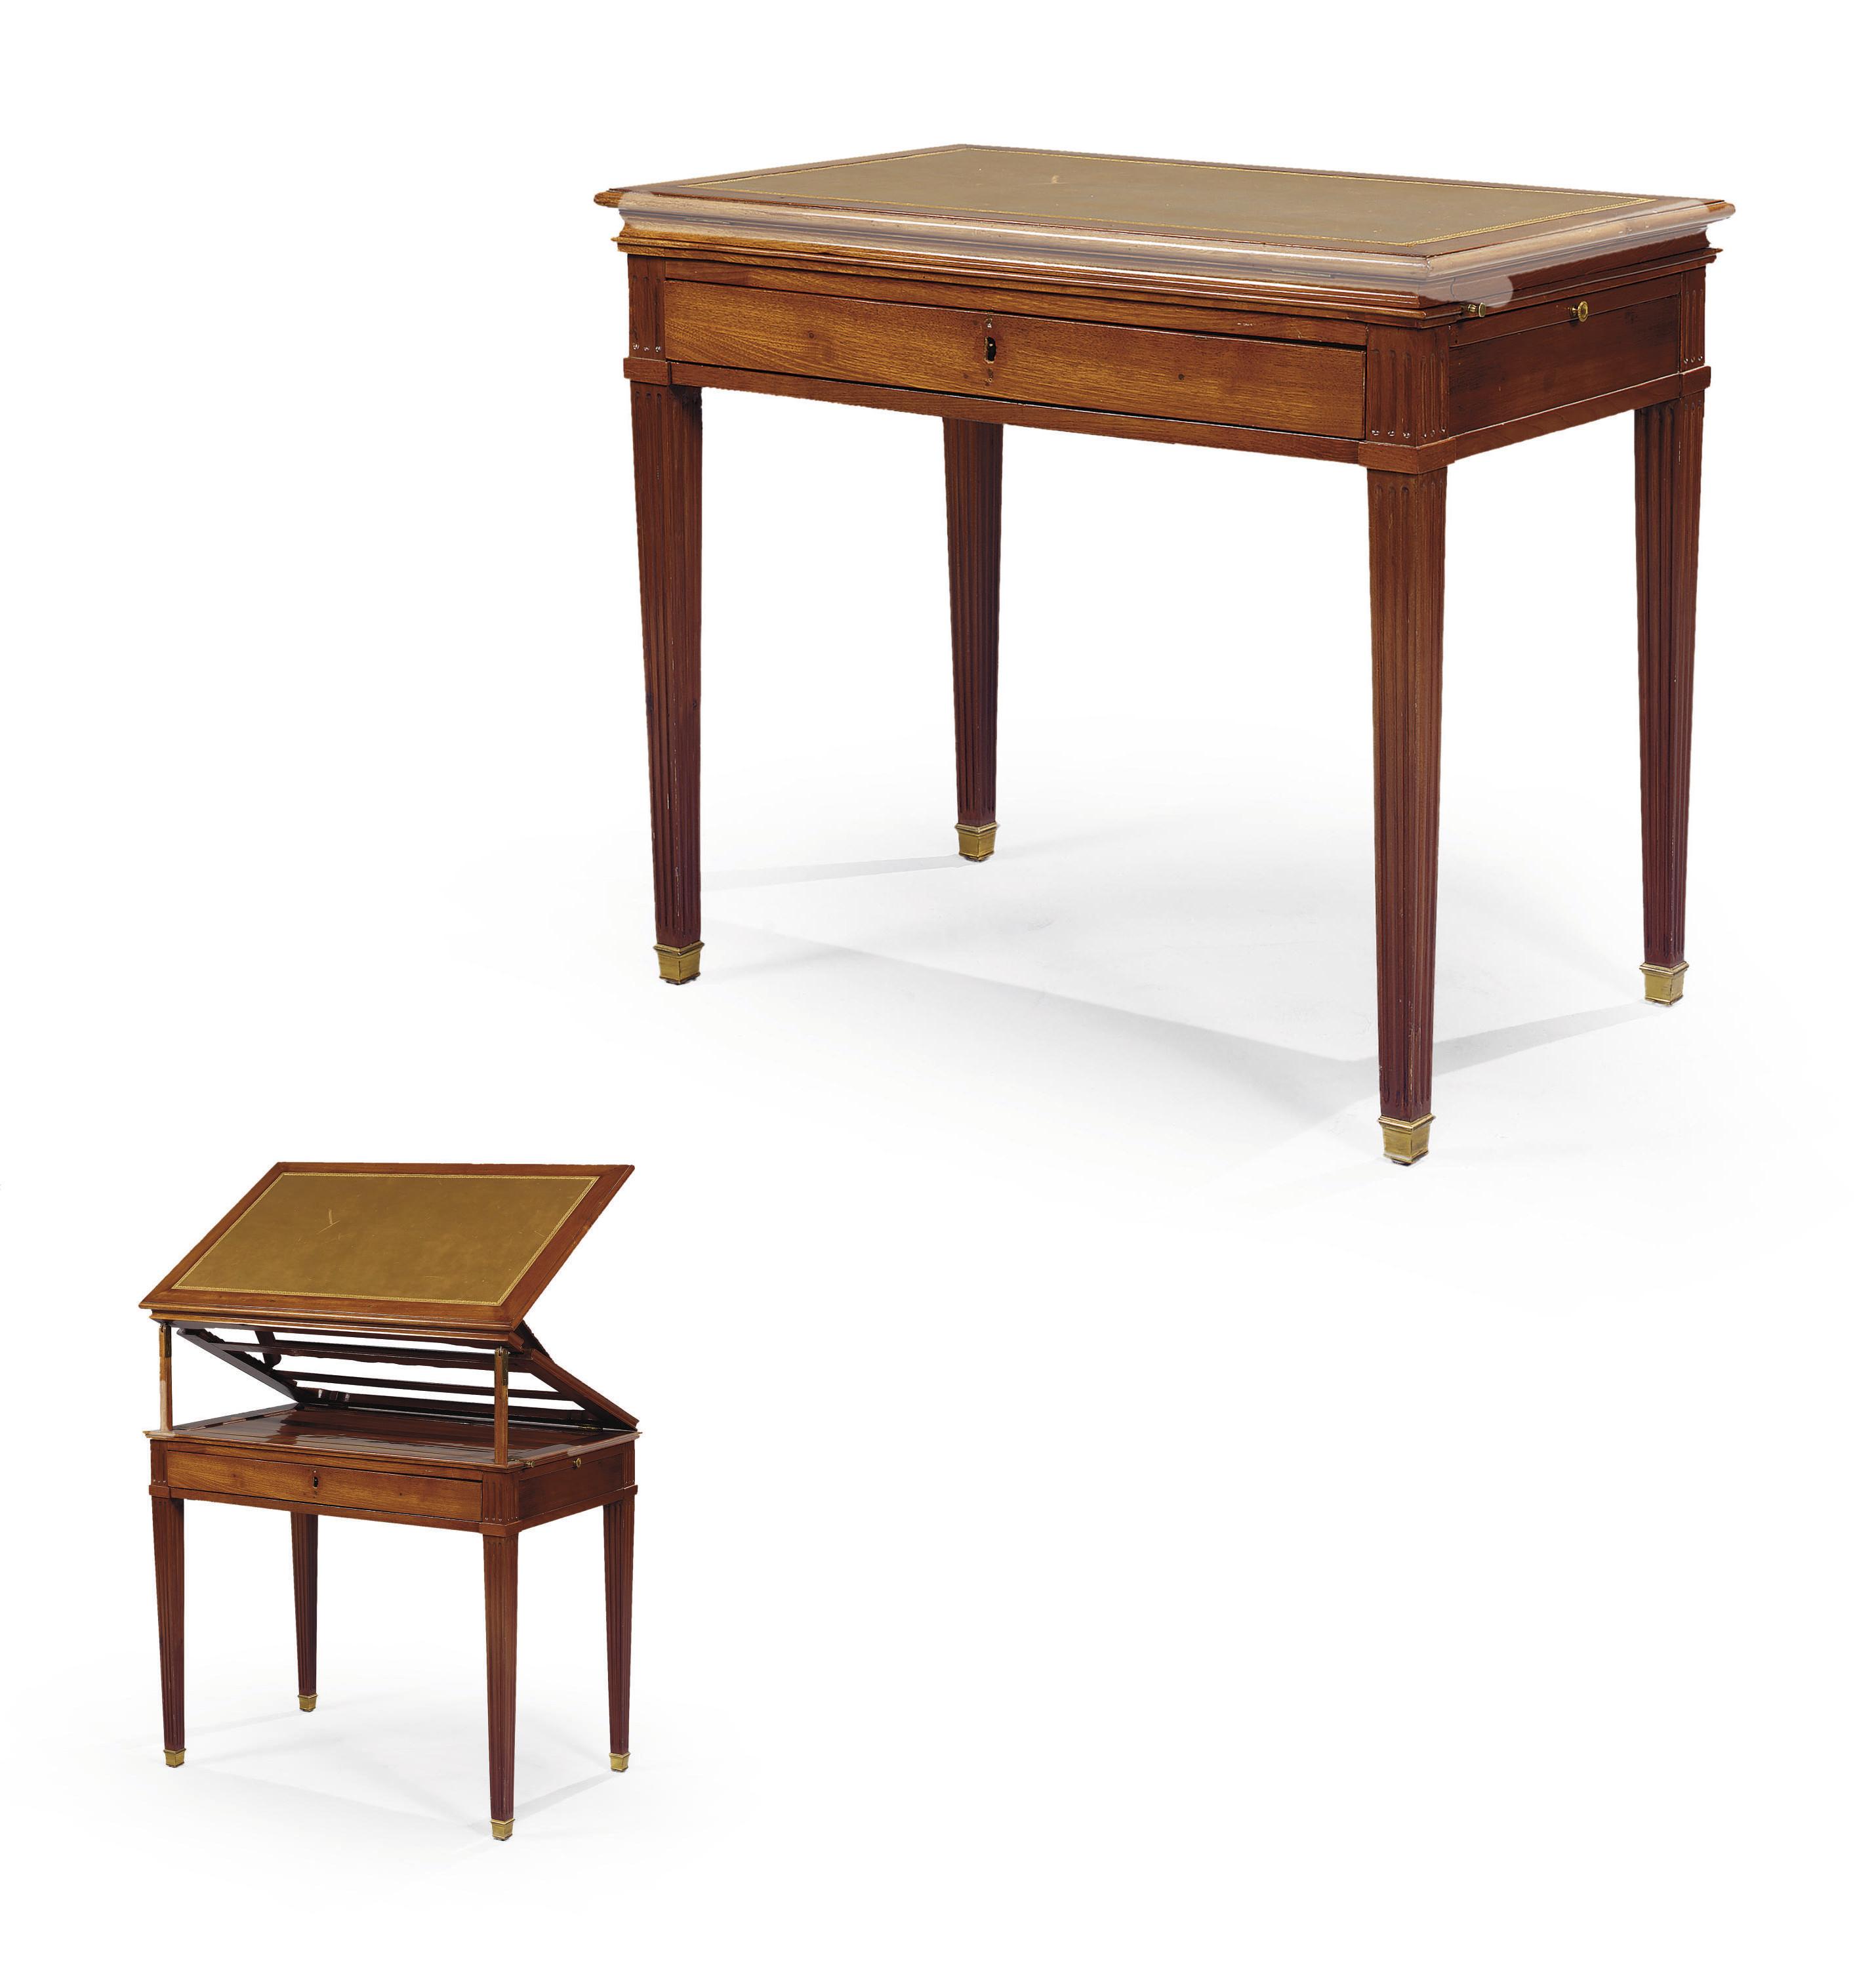 TABLE A LA TRONCHIN D'EPOQUE LOUIS XVI